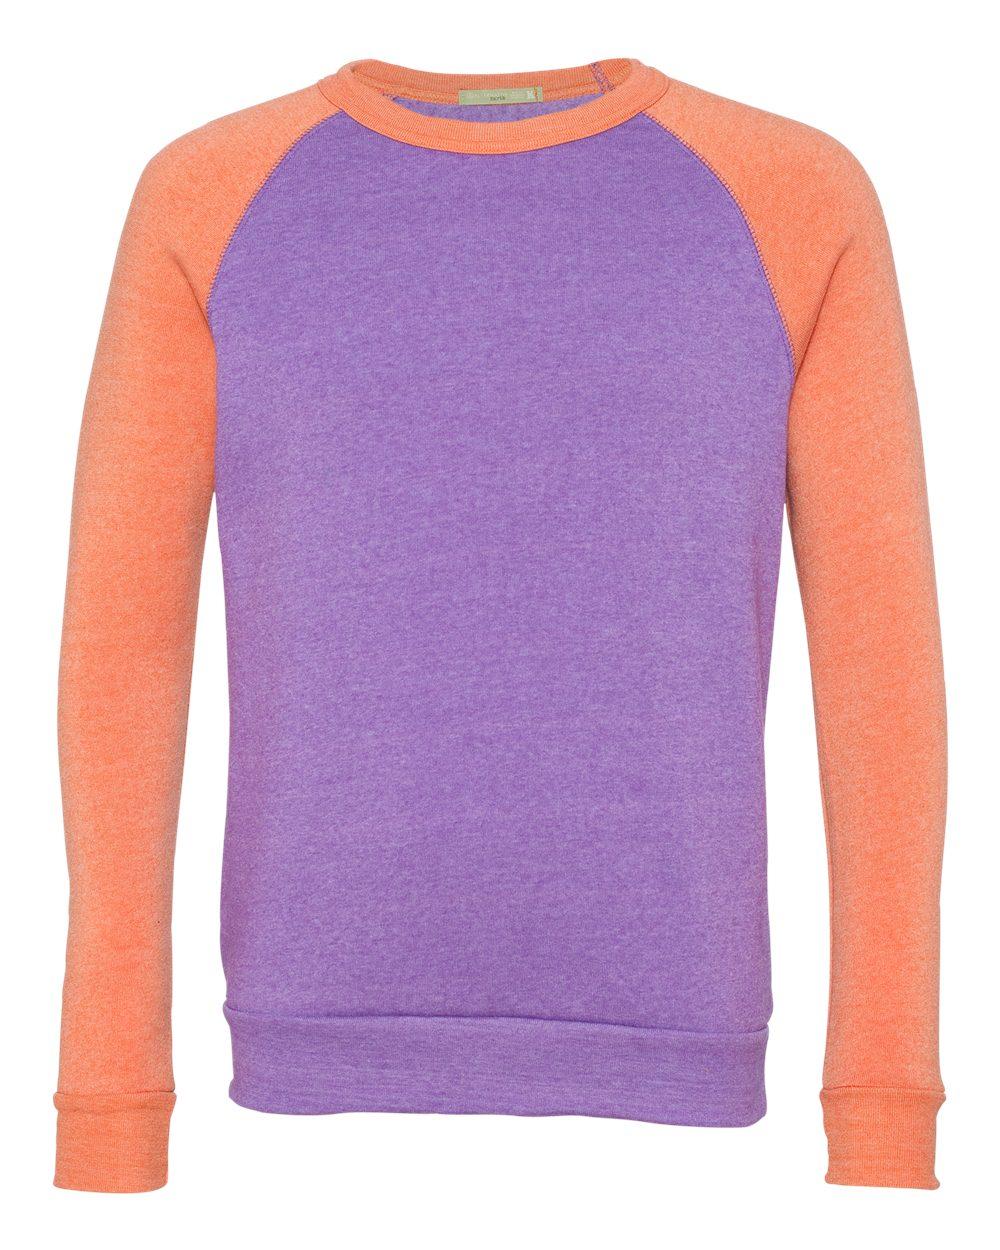 Eco True Purple / Eco True Orange